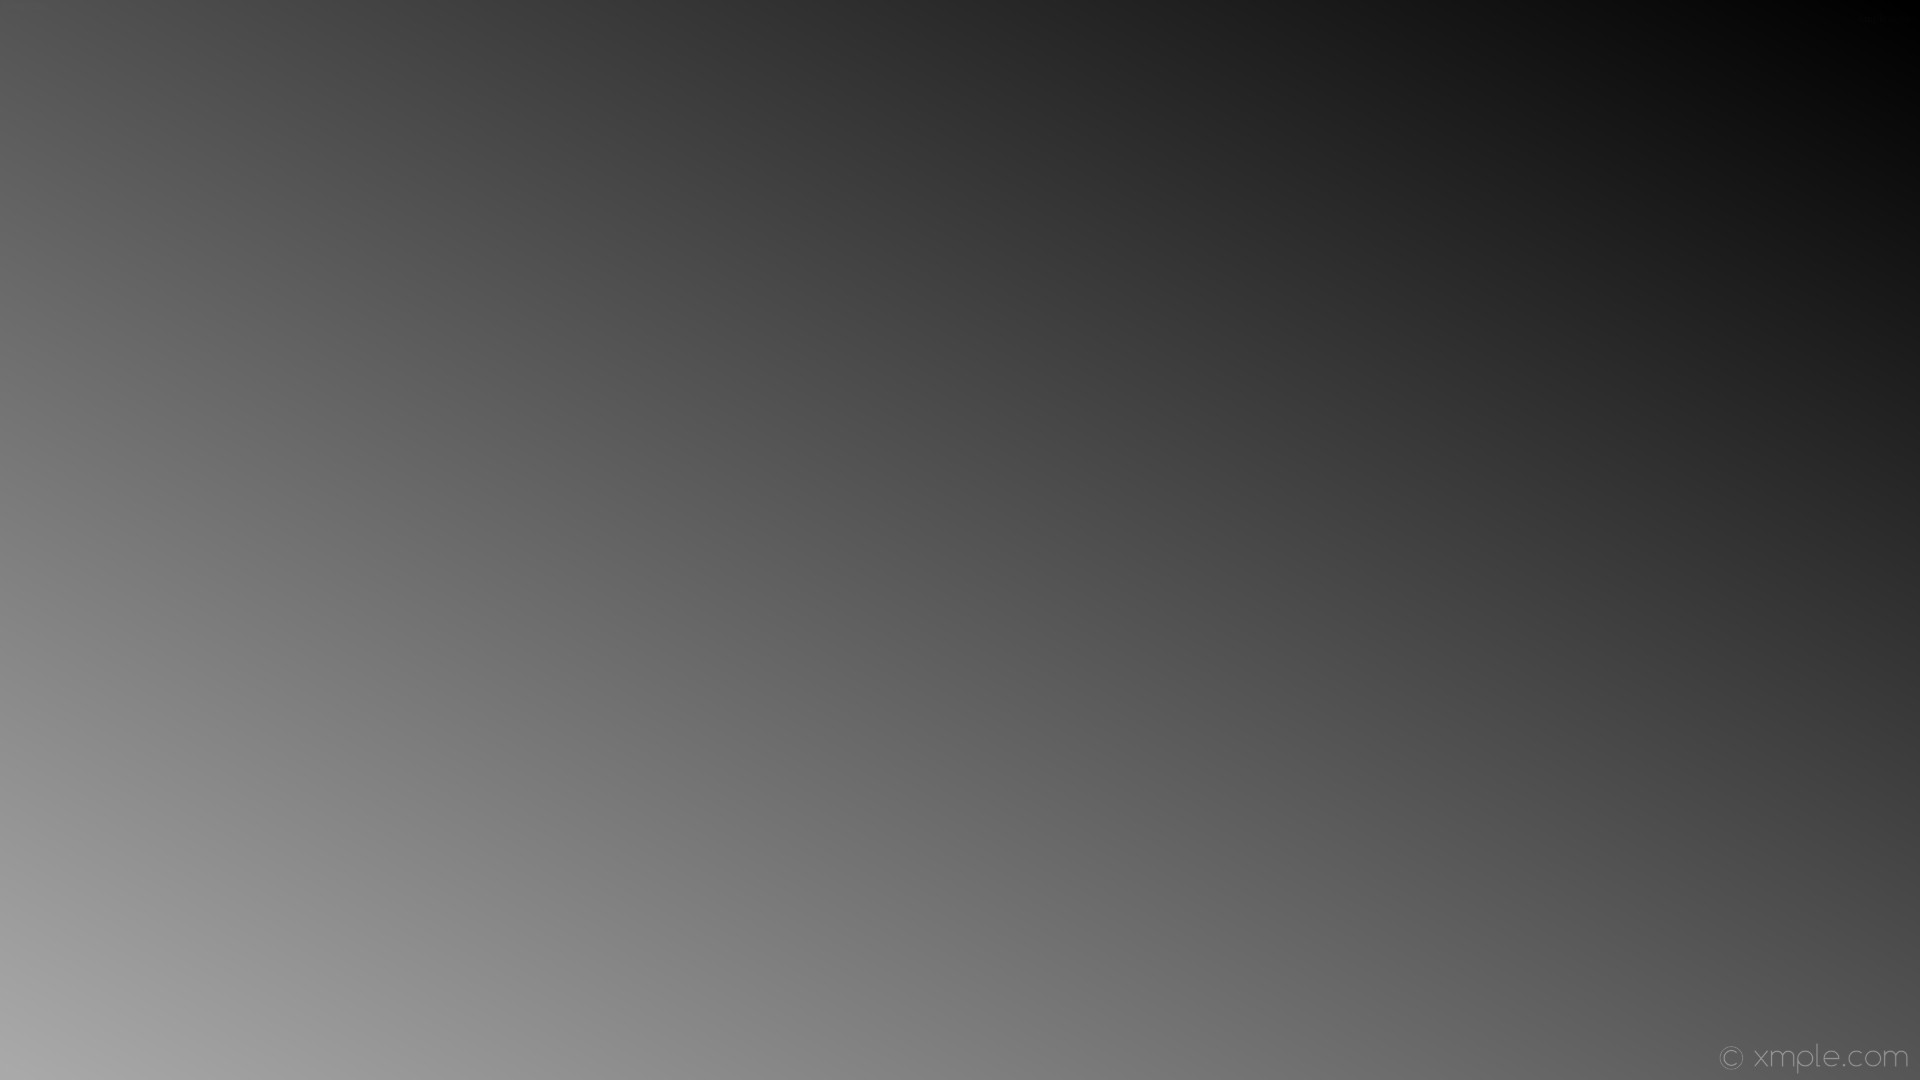 wallpaper grey black gradient linear dark gray #a9a9a9 #000000 210°